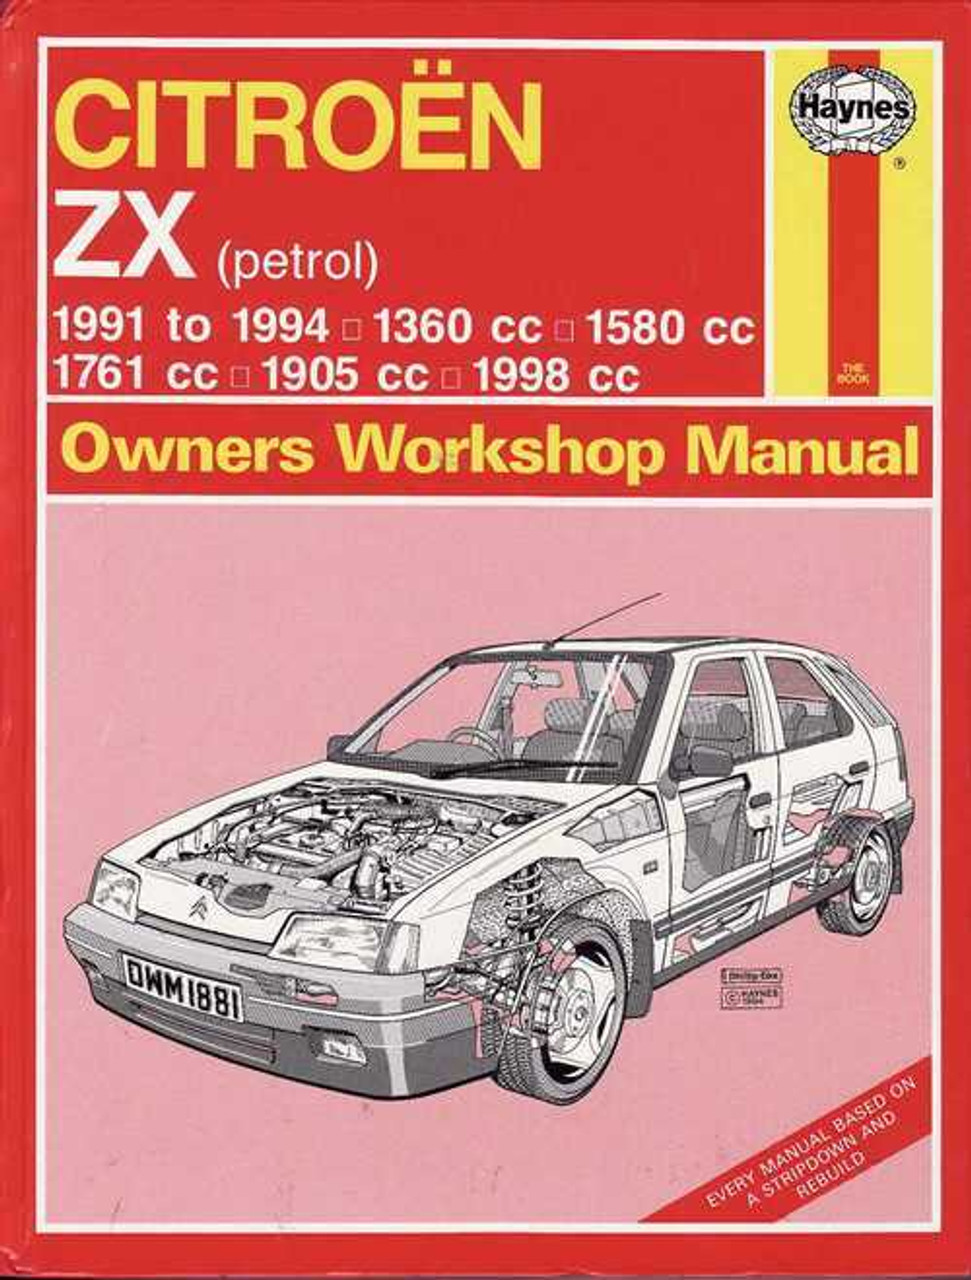 citroen zx petrol 1991 1994 workshop manual rh automotobookshop com au manual citroen zx manuel citroen zx 1.9 diesel